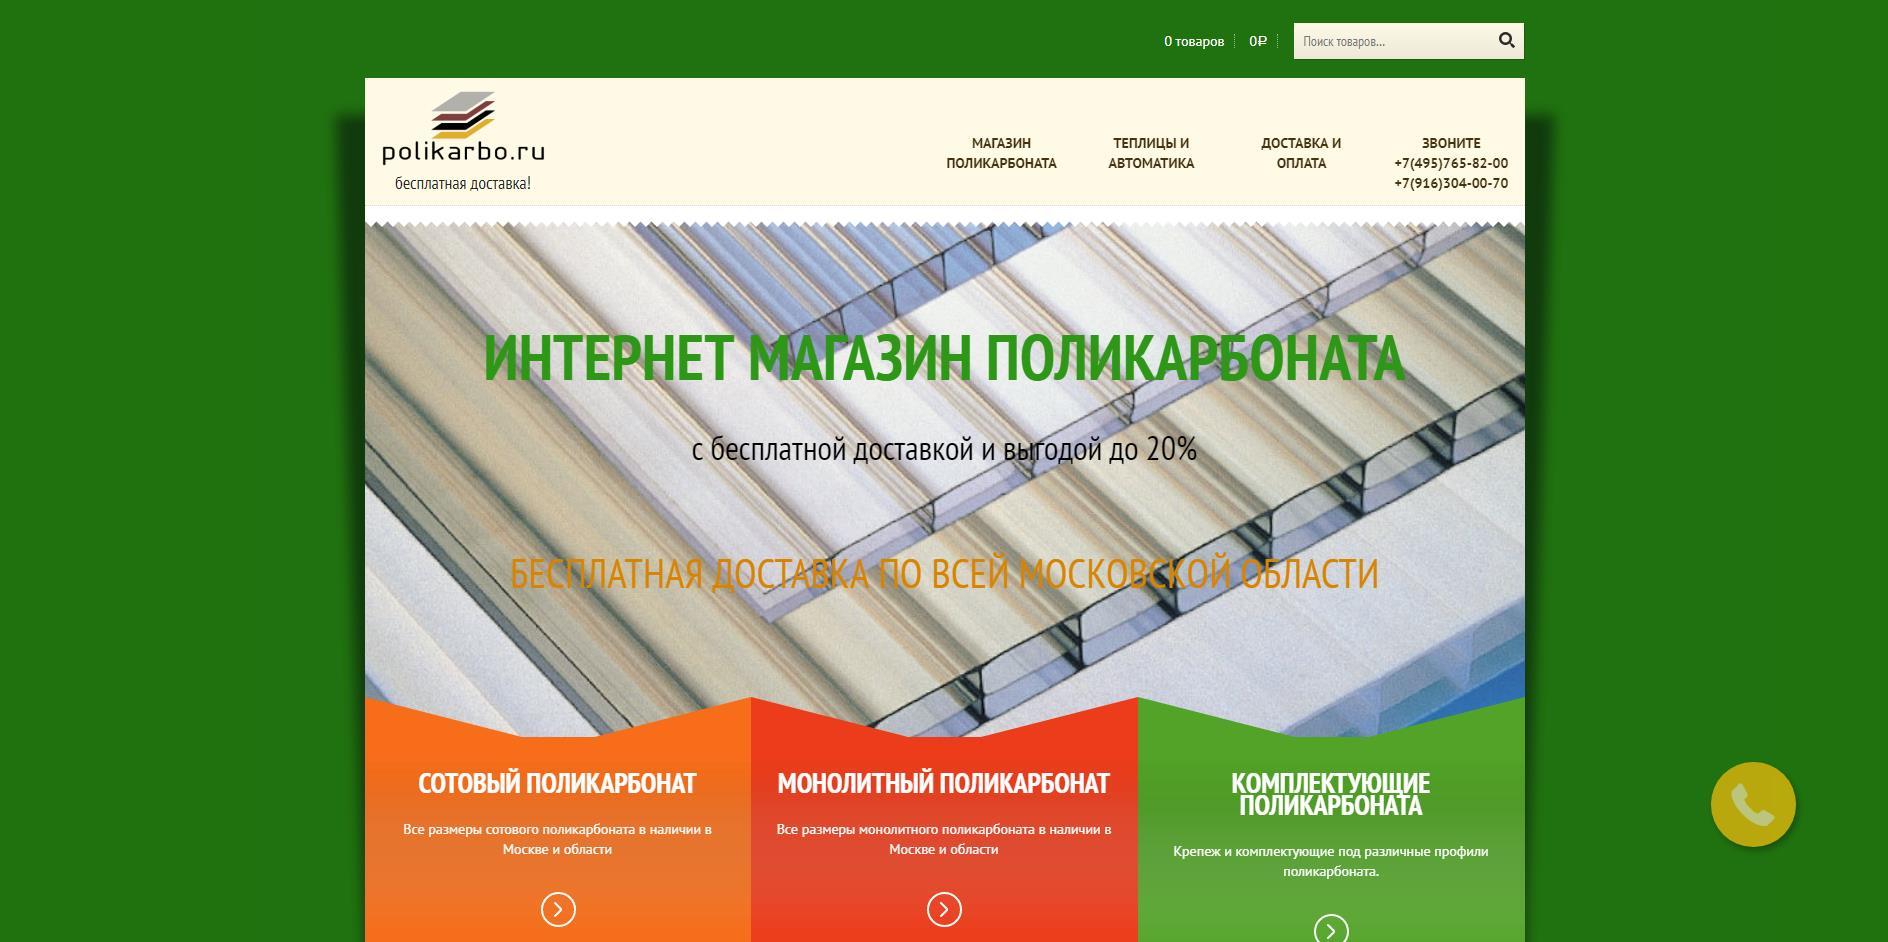 Рекламная кампания Google.AdWords для сайта polikarbo.ru